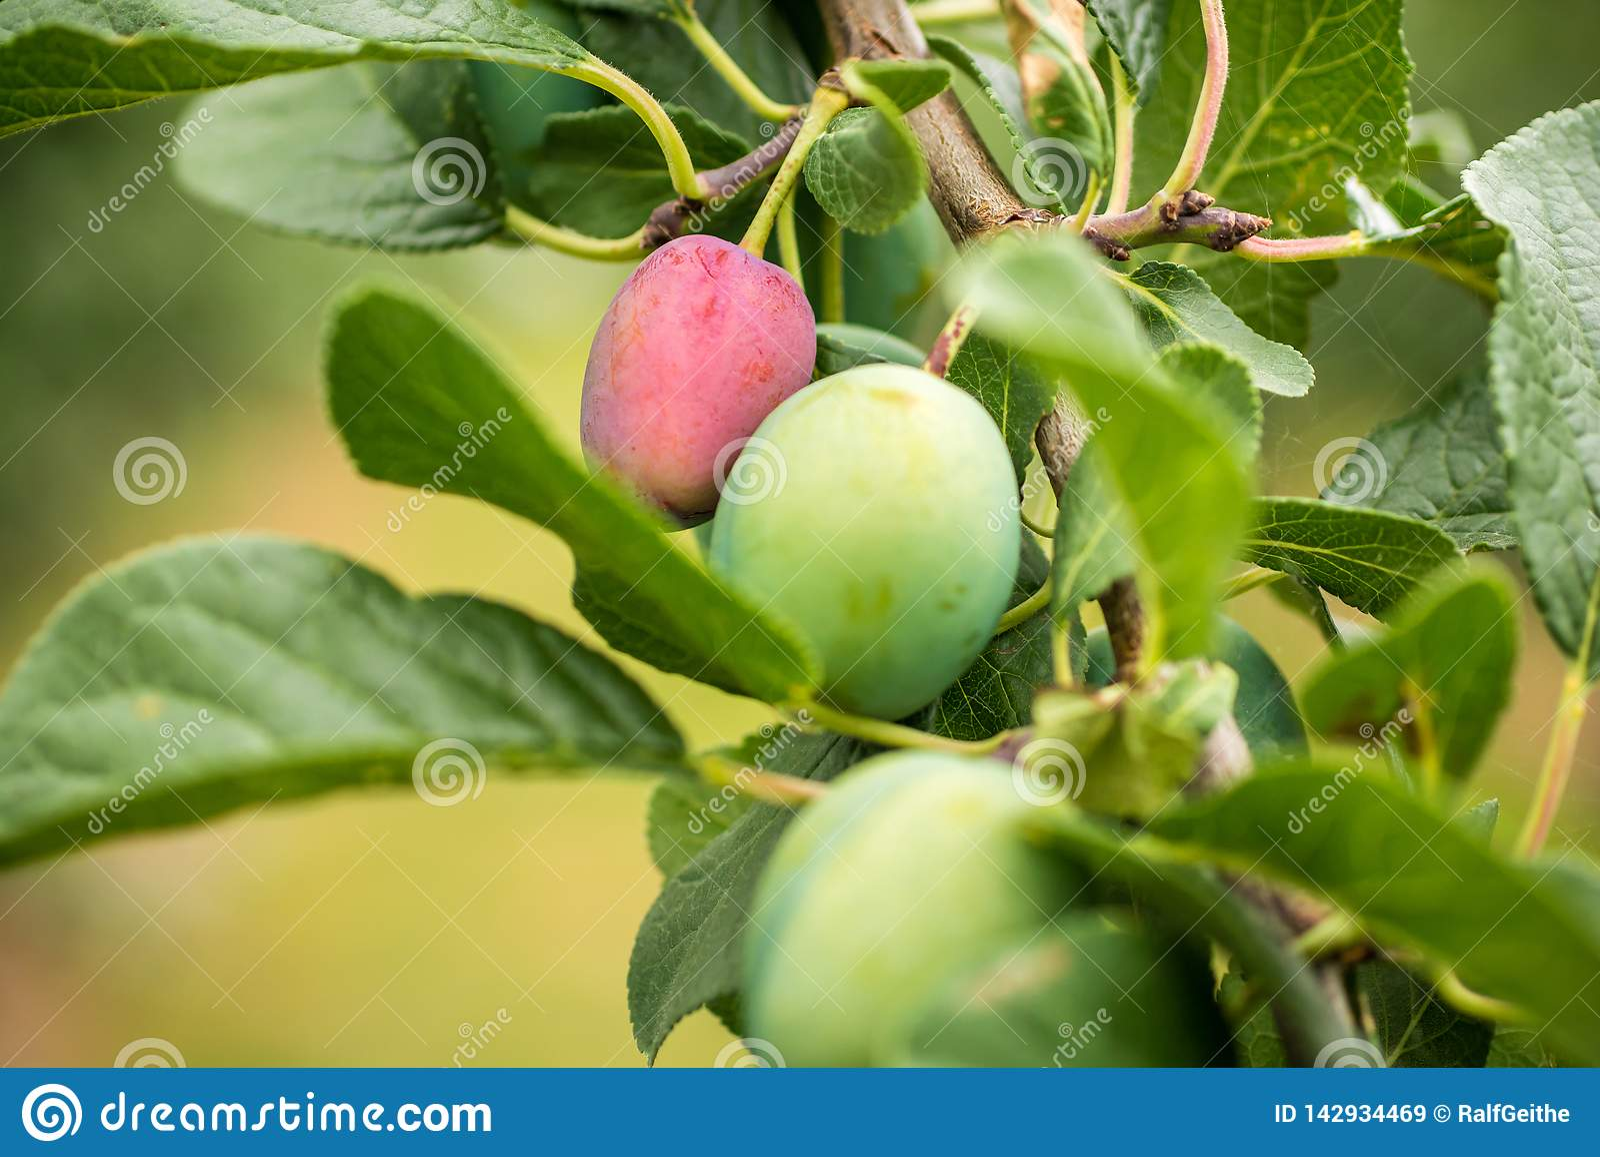 Plommoner på ett plommonträd med olika etapper av mognad av frukten